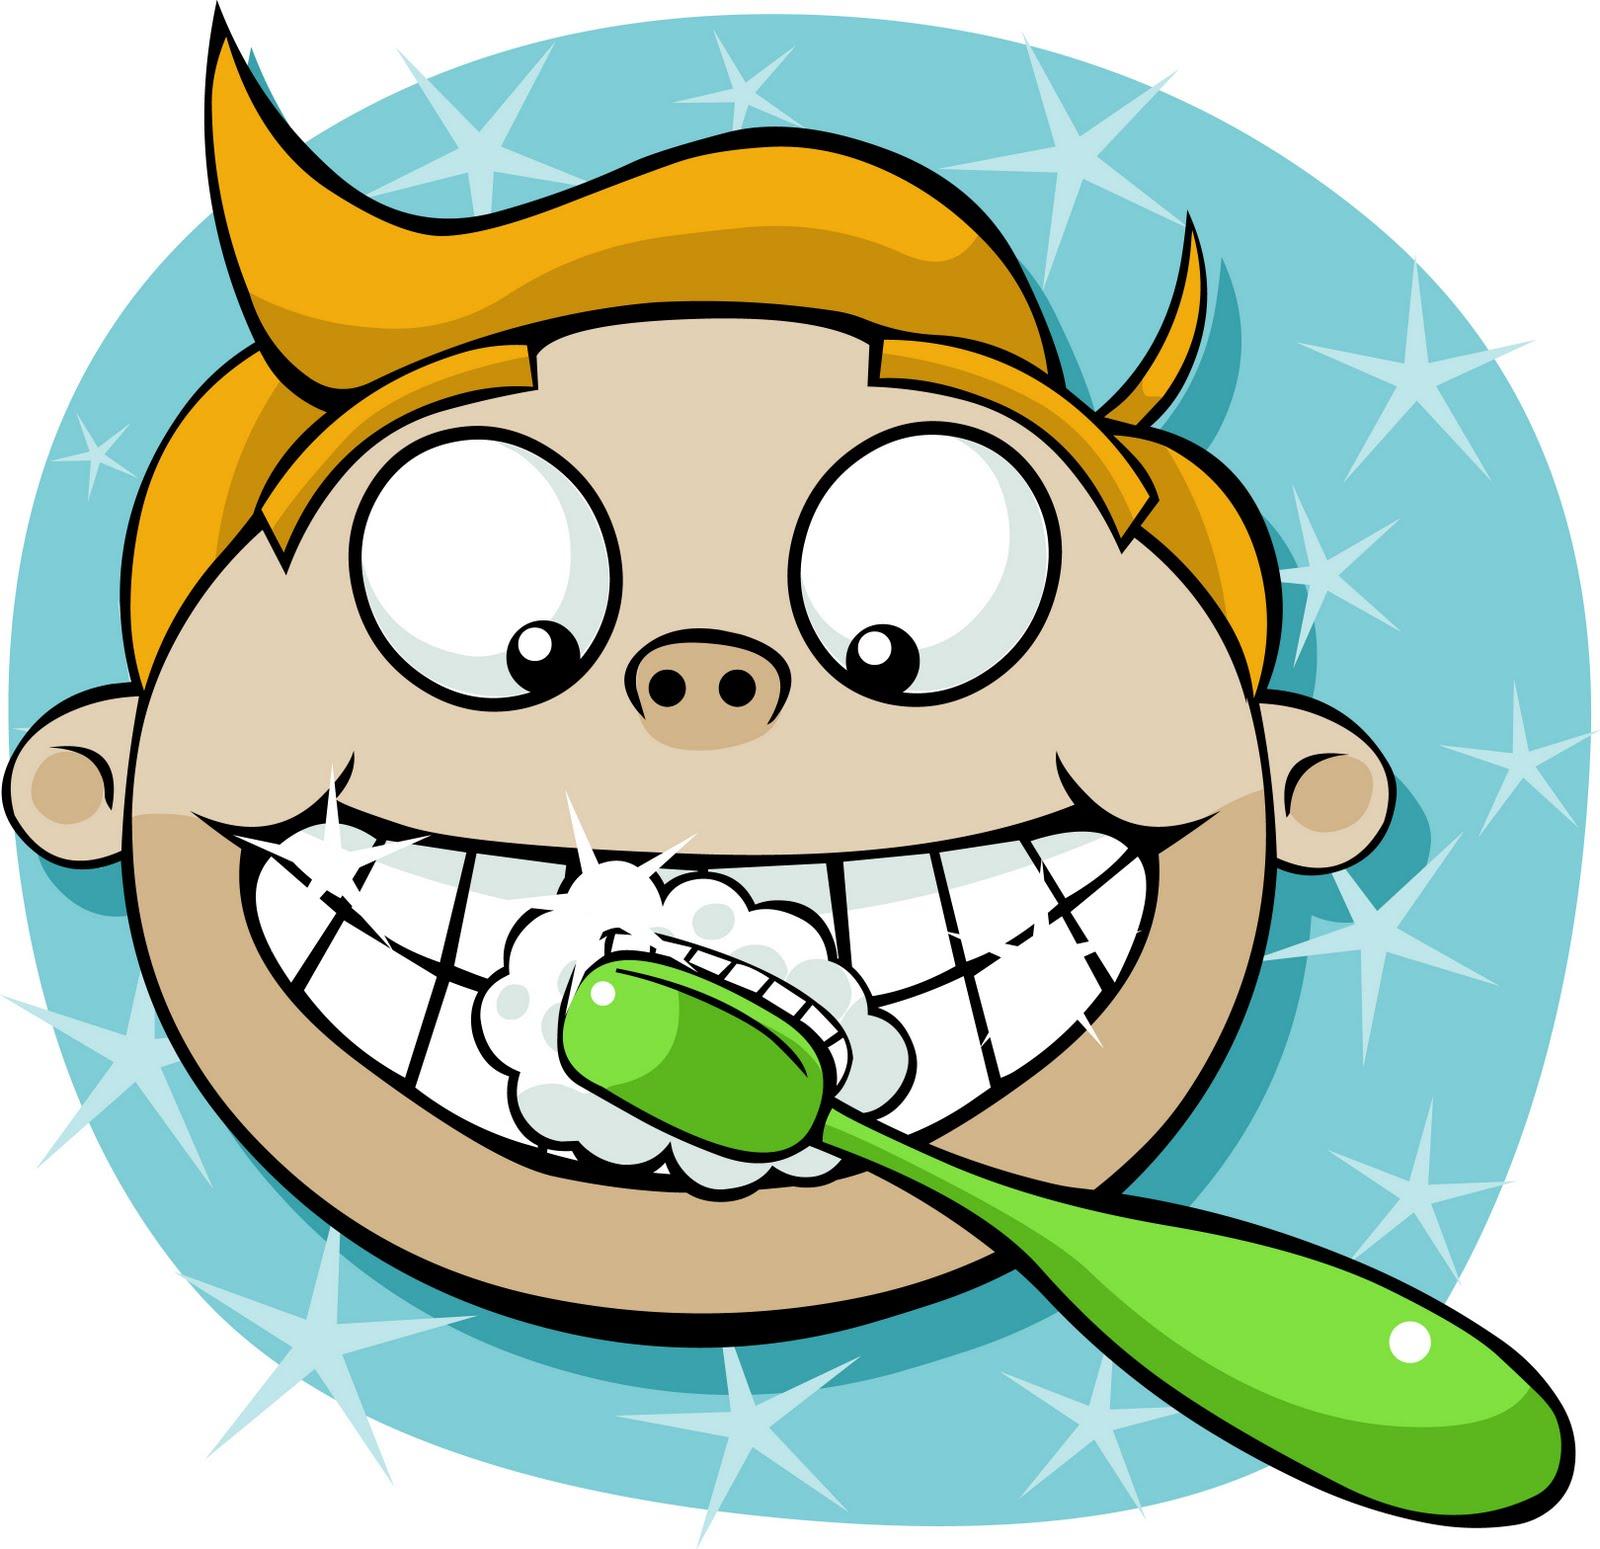 1600x1549 Chores Brush Teeth Clip Art Brush Teeth Teeth Image